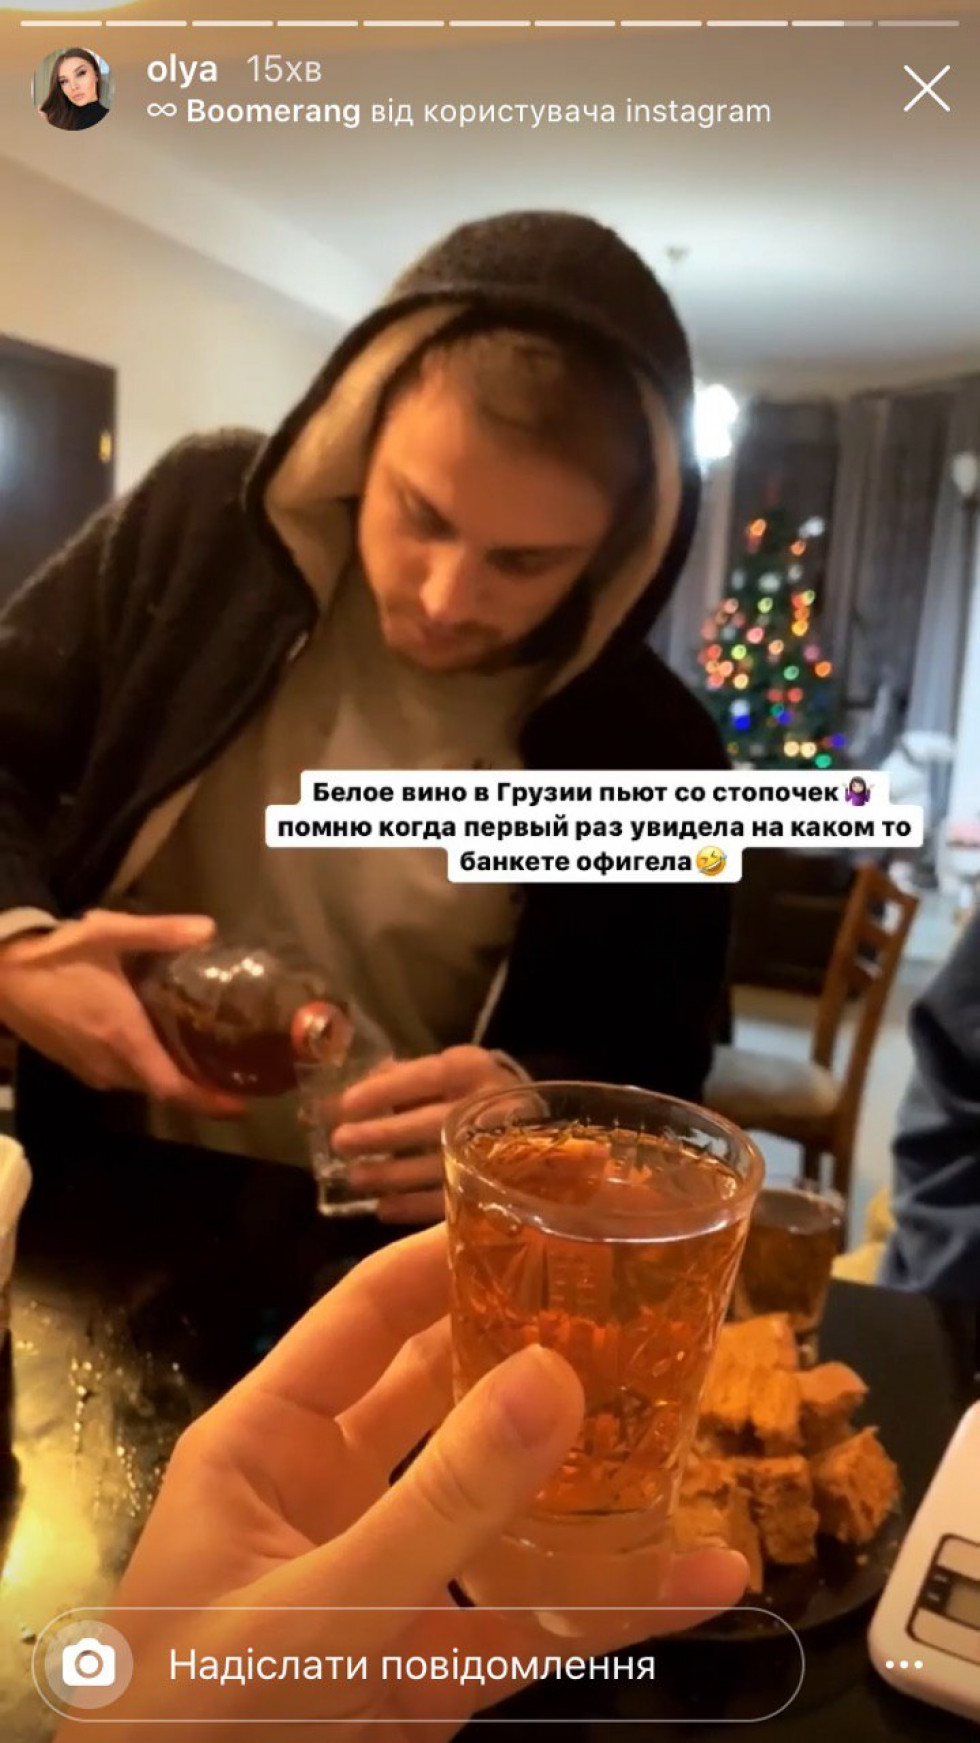 Ольга Кобахідзе